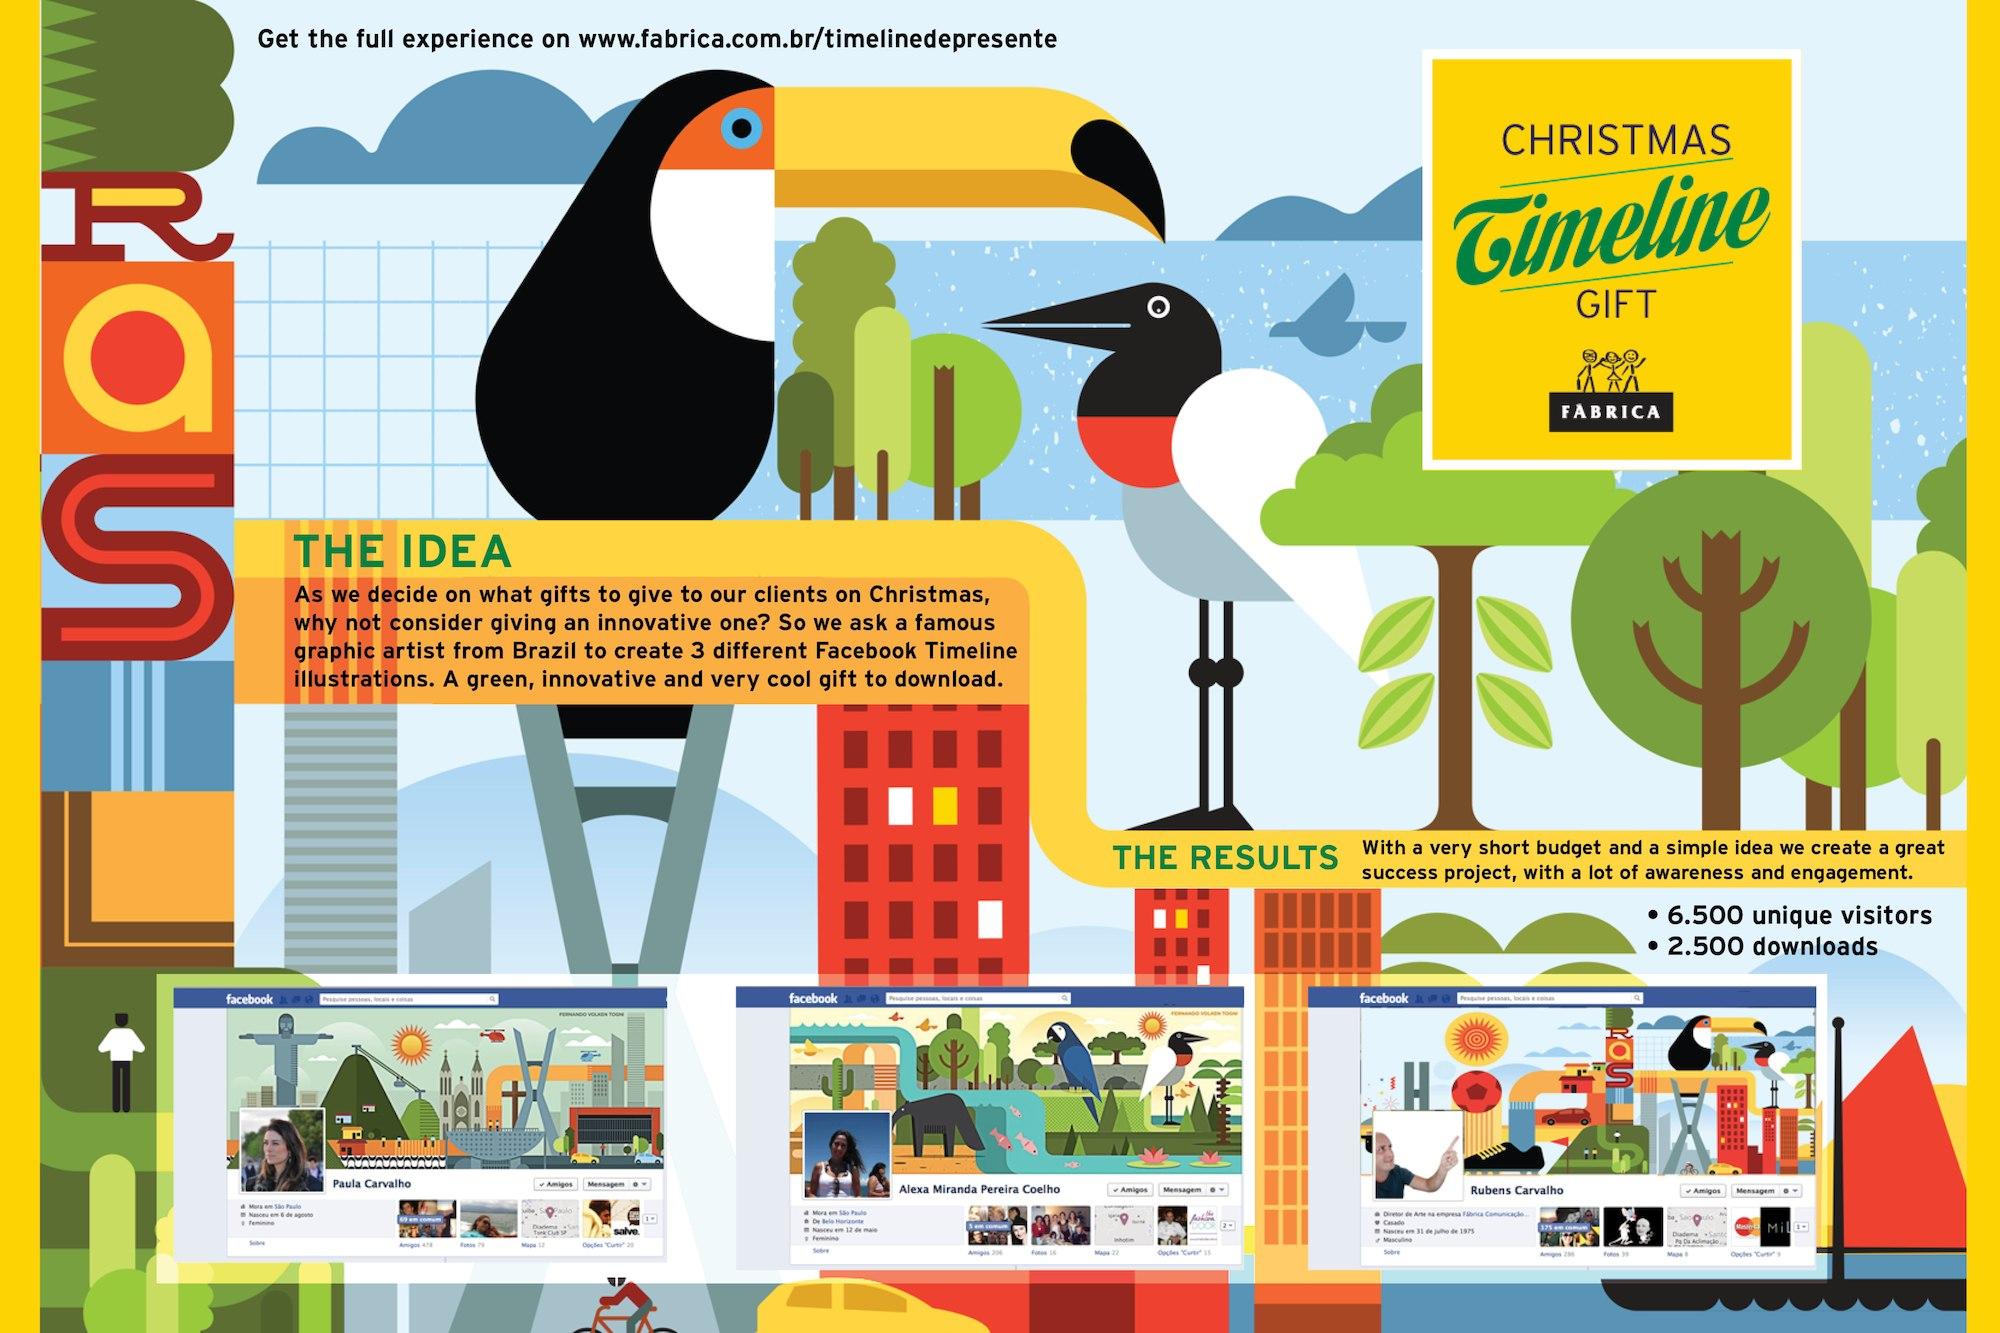 web-fernando-volken-togni-fabrica-christmas-gift